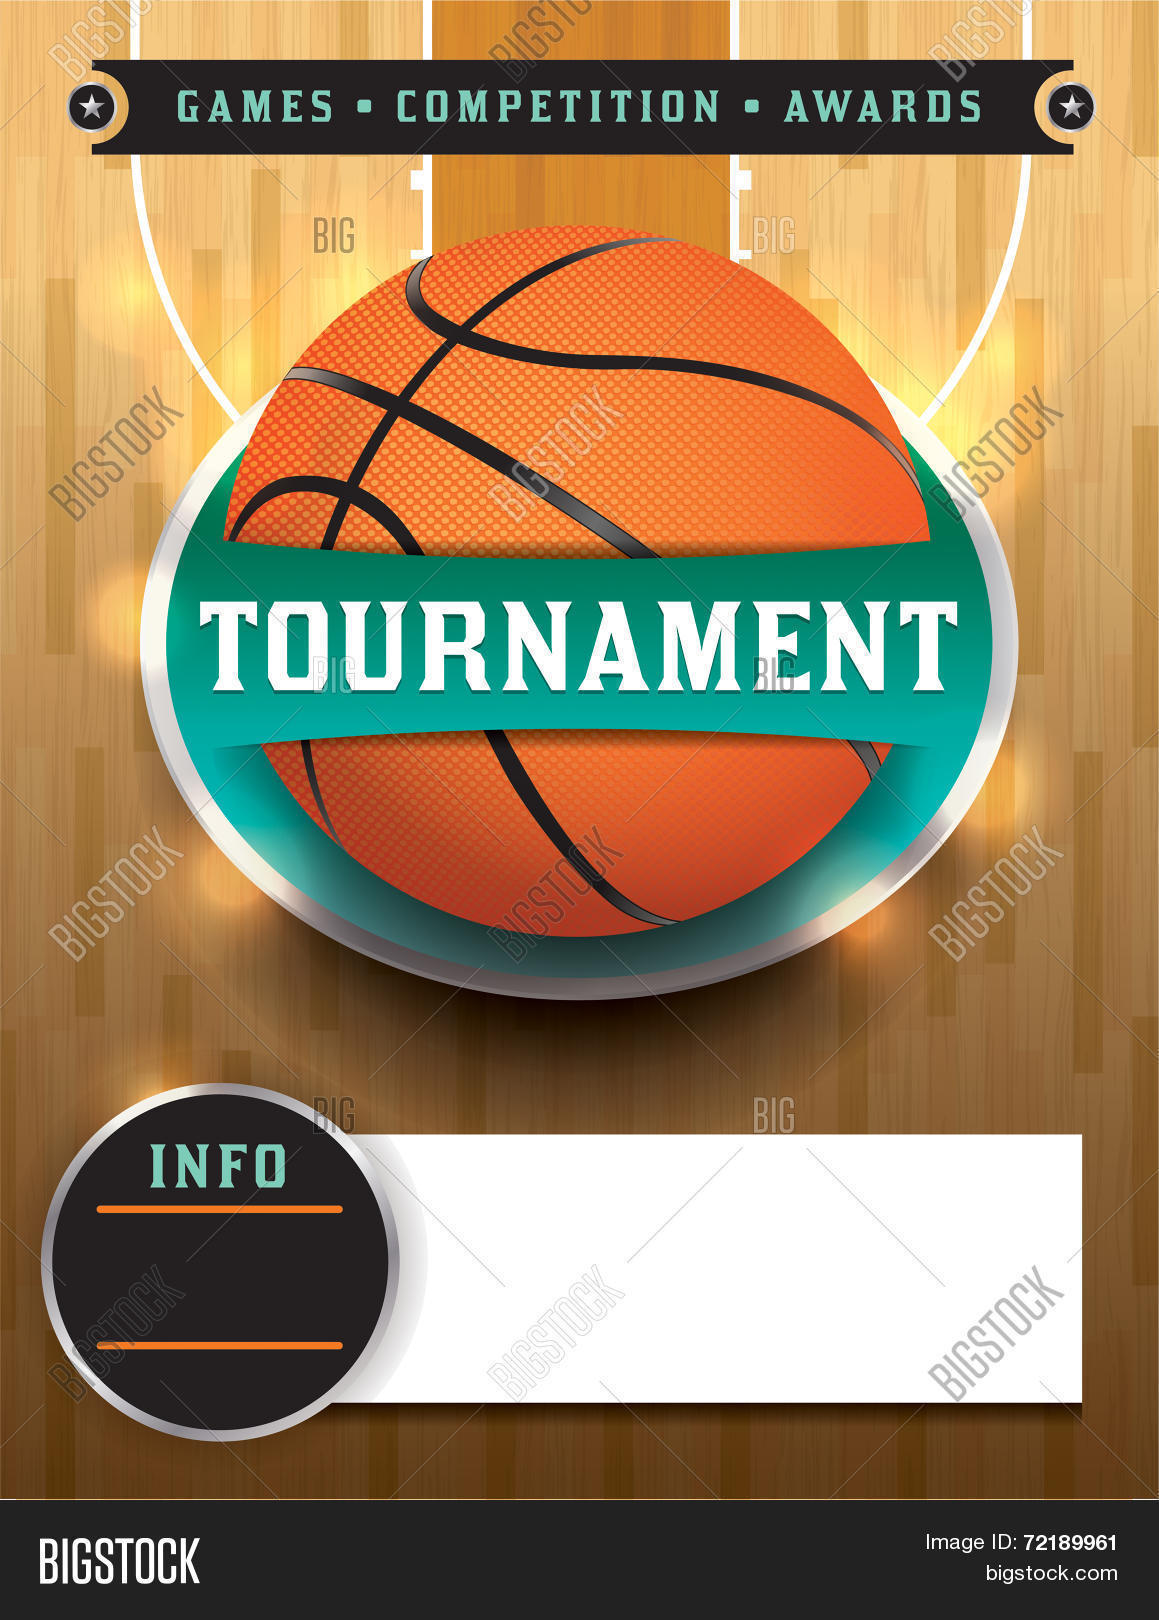 Basketball Tournament Template Vector & Photo | Bigstock